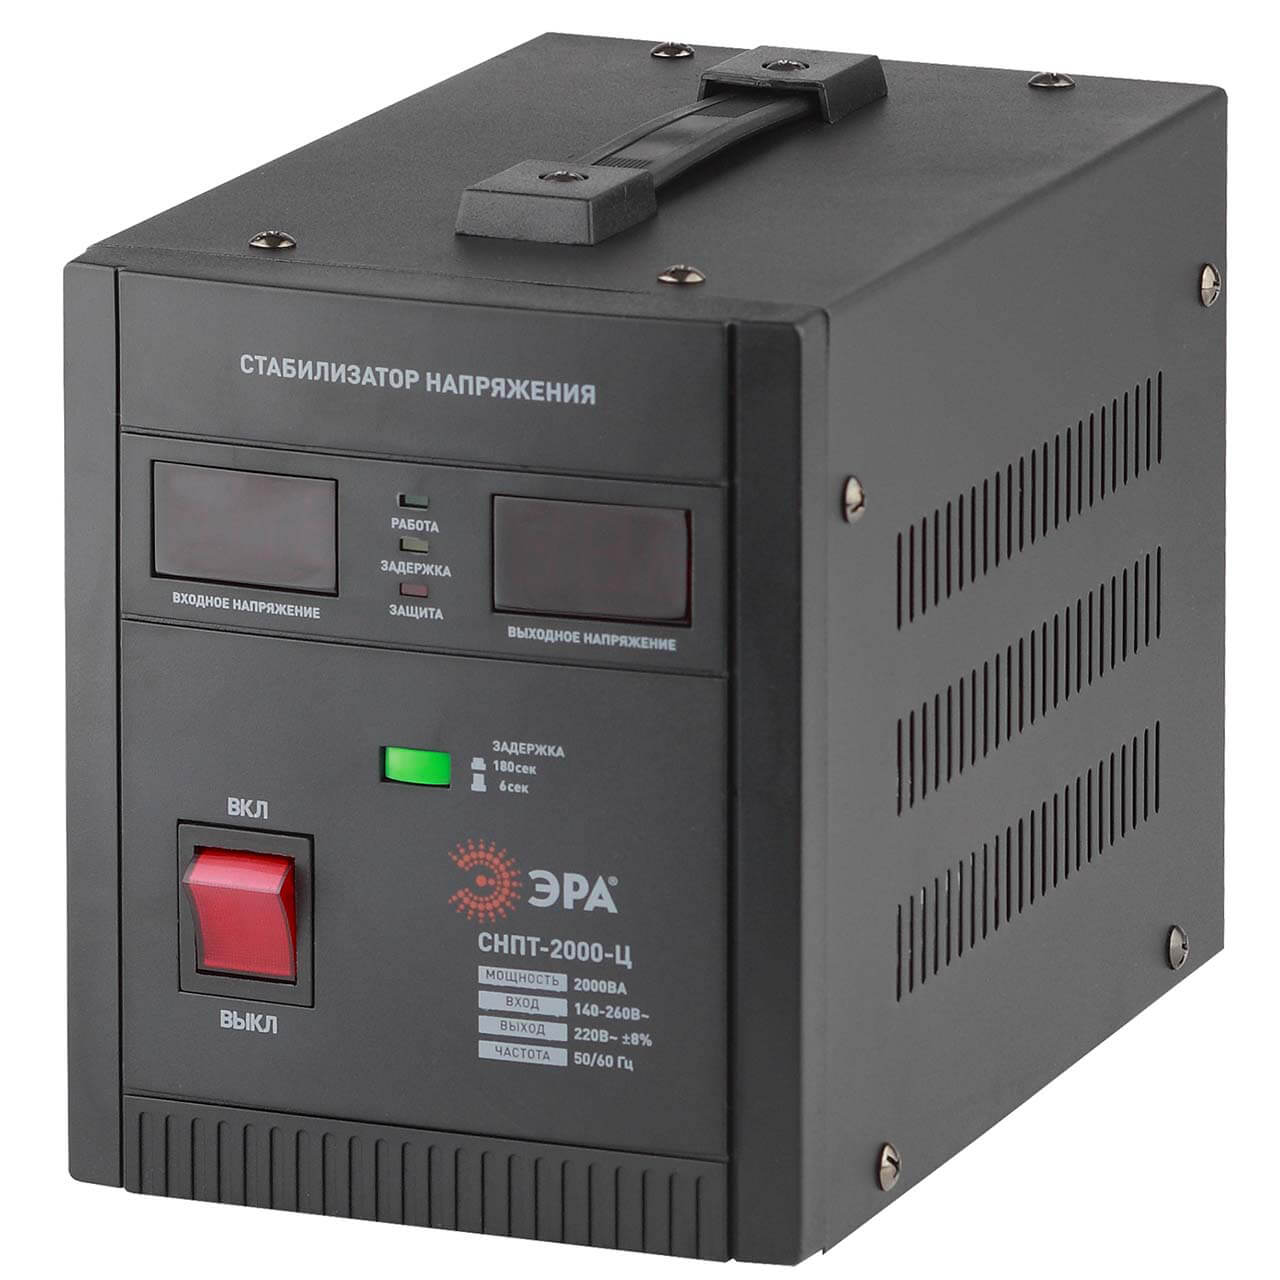 Стабилизатор напряжения ЭРА СНПТ-2000-Ц цена